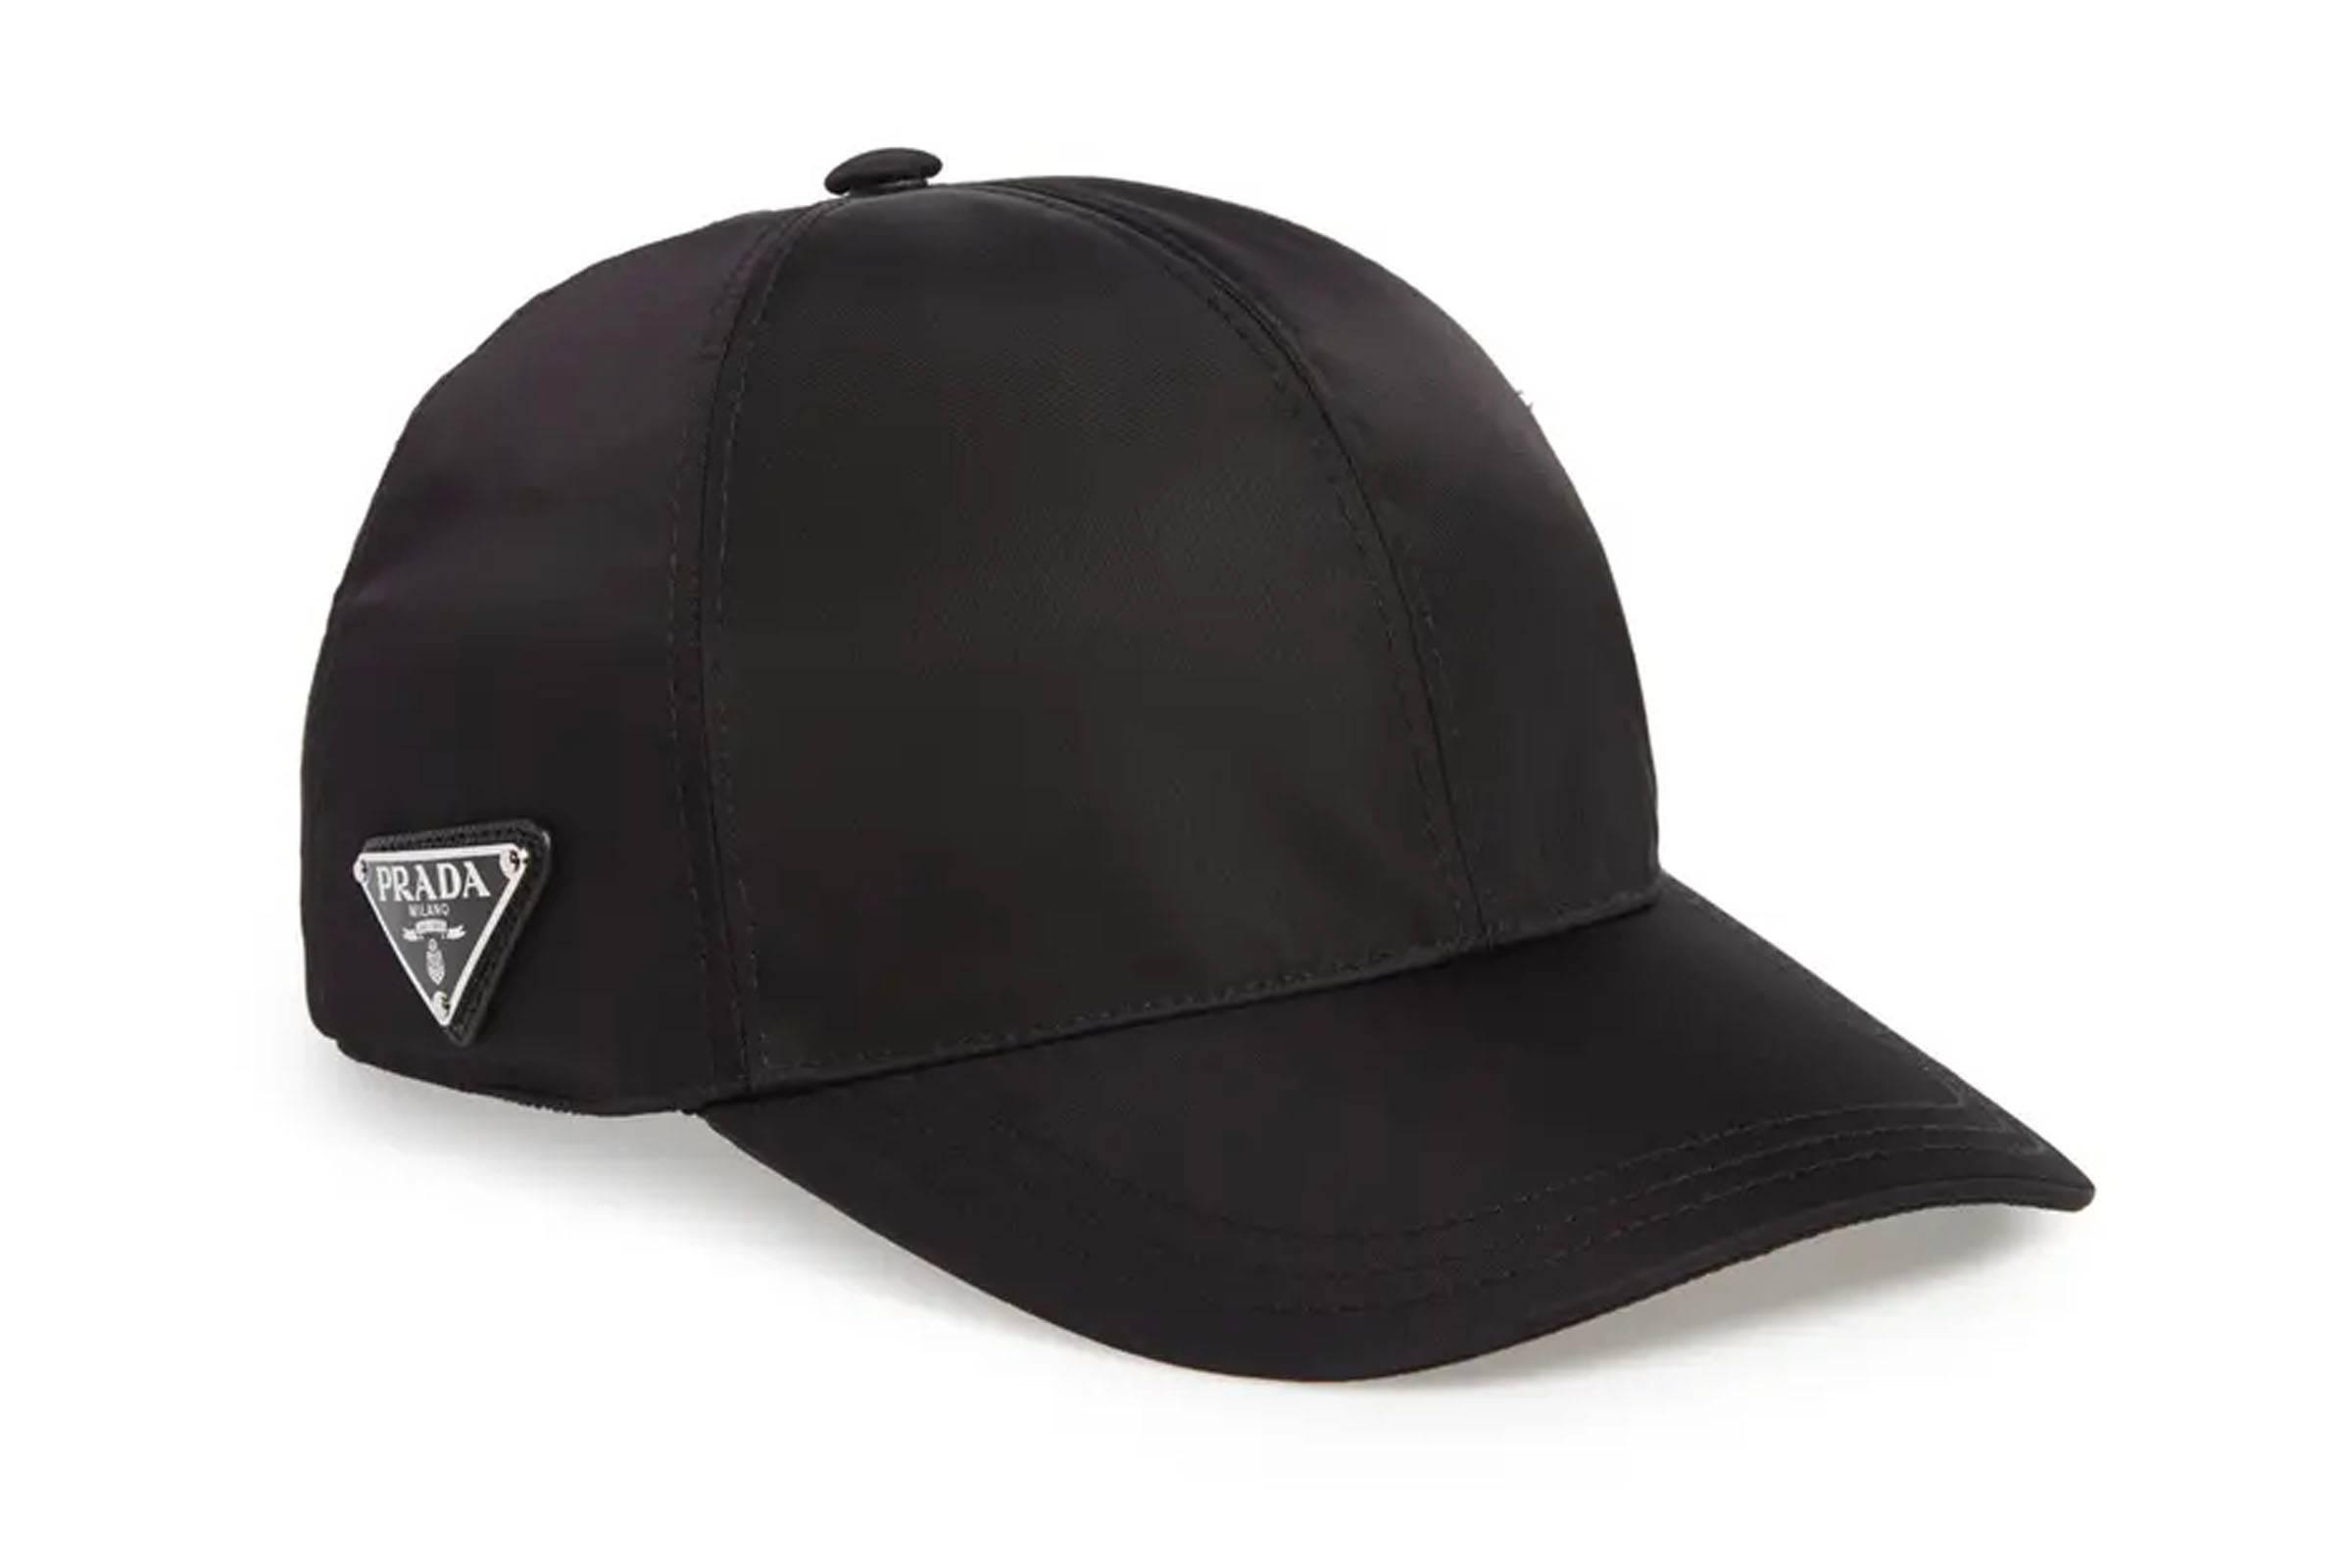 Prada Nylon Baseball Cap